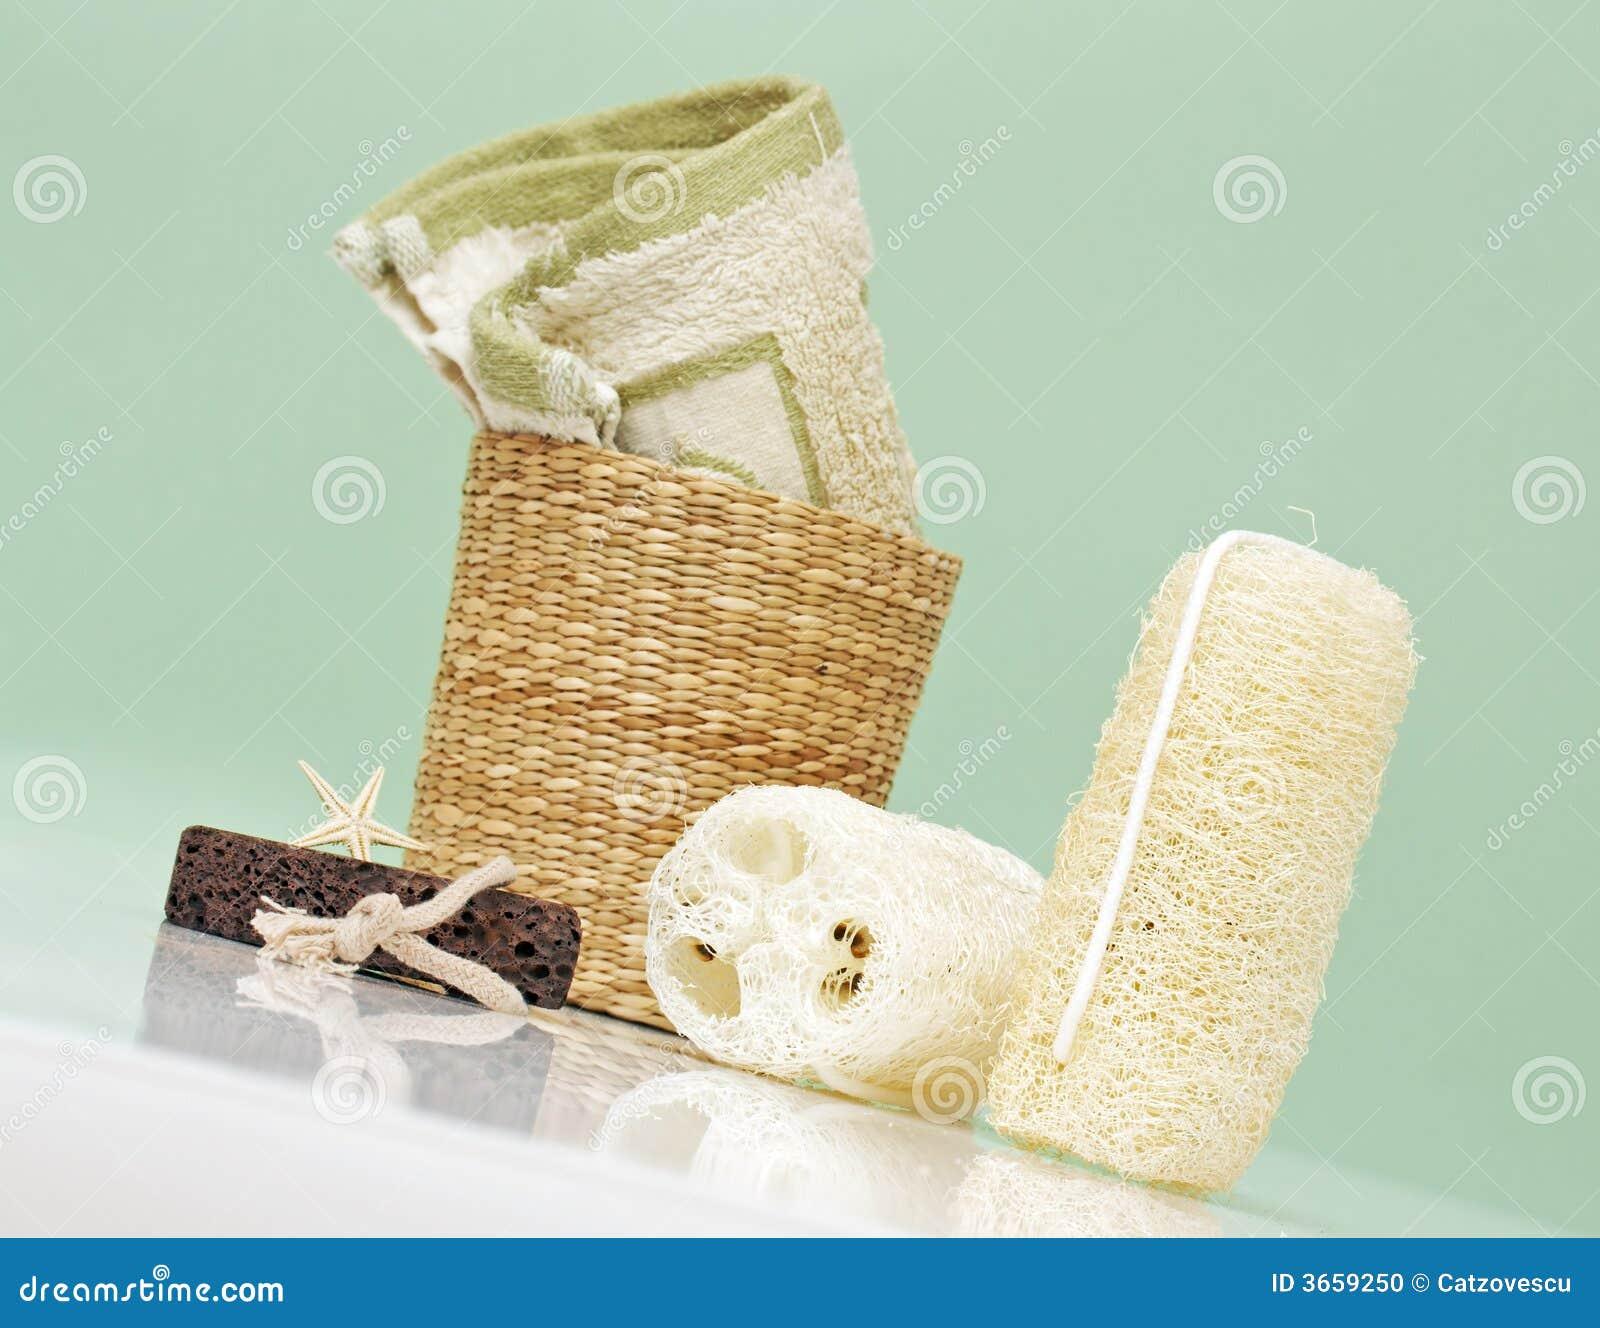 Spa accessories, bath items